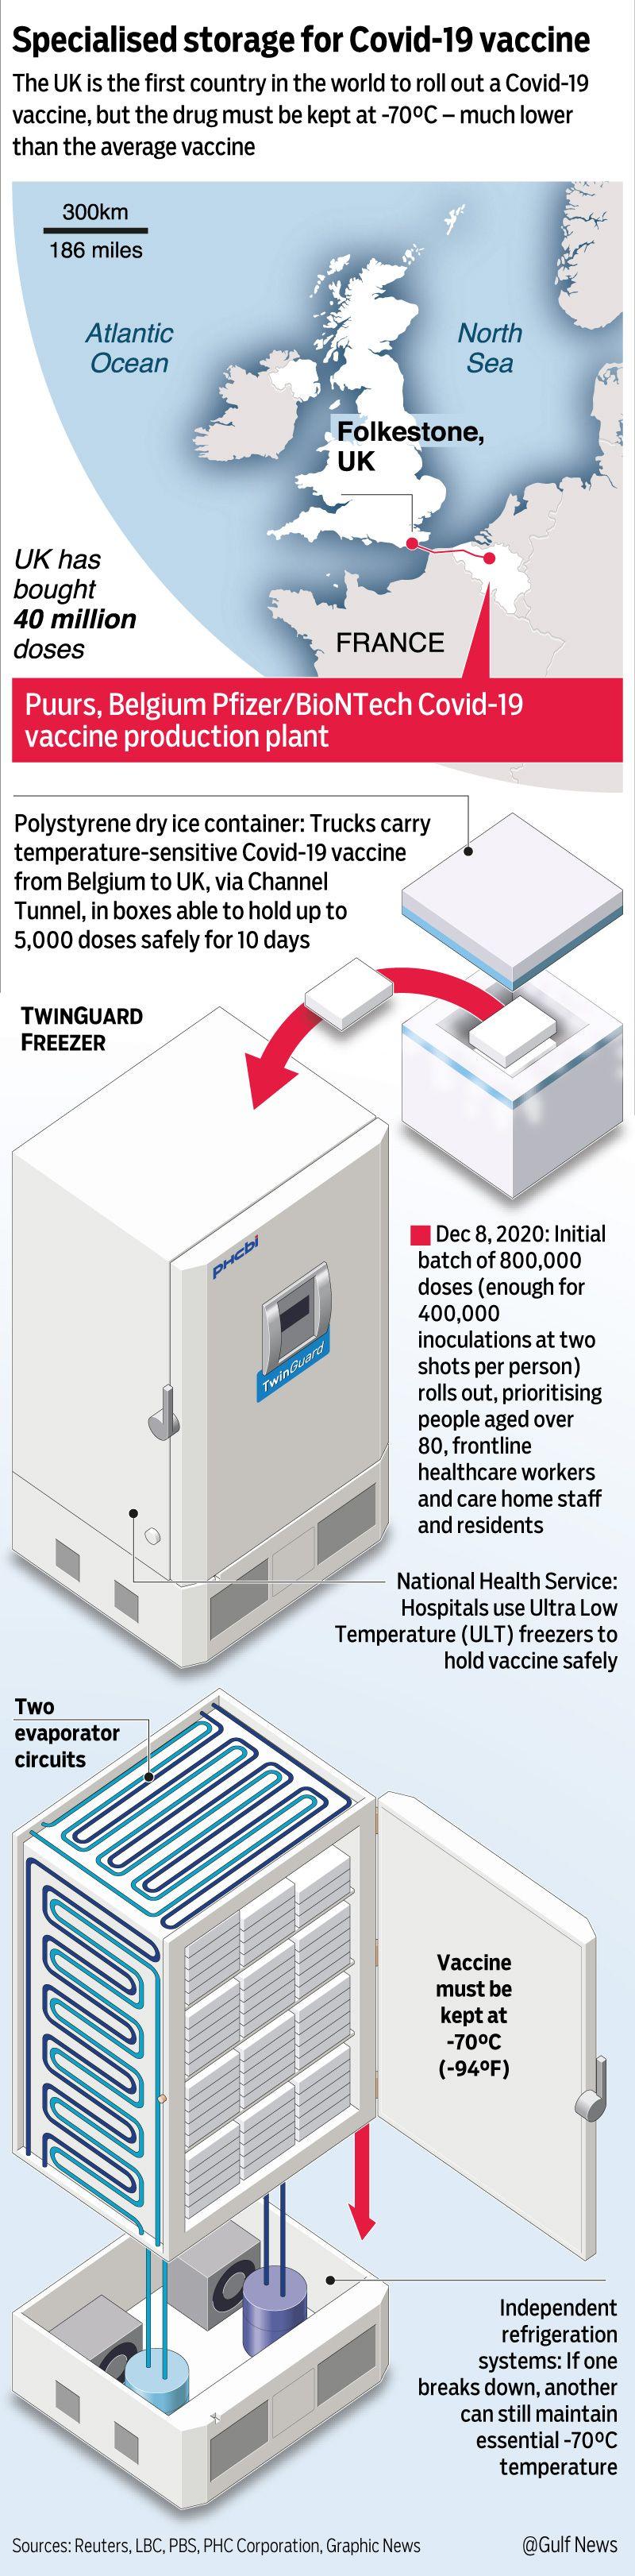 Graphic Specialised storage covid vaccine pfizer